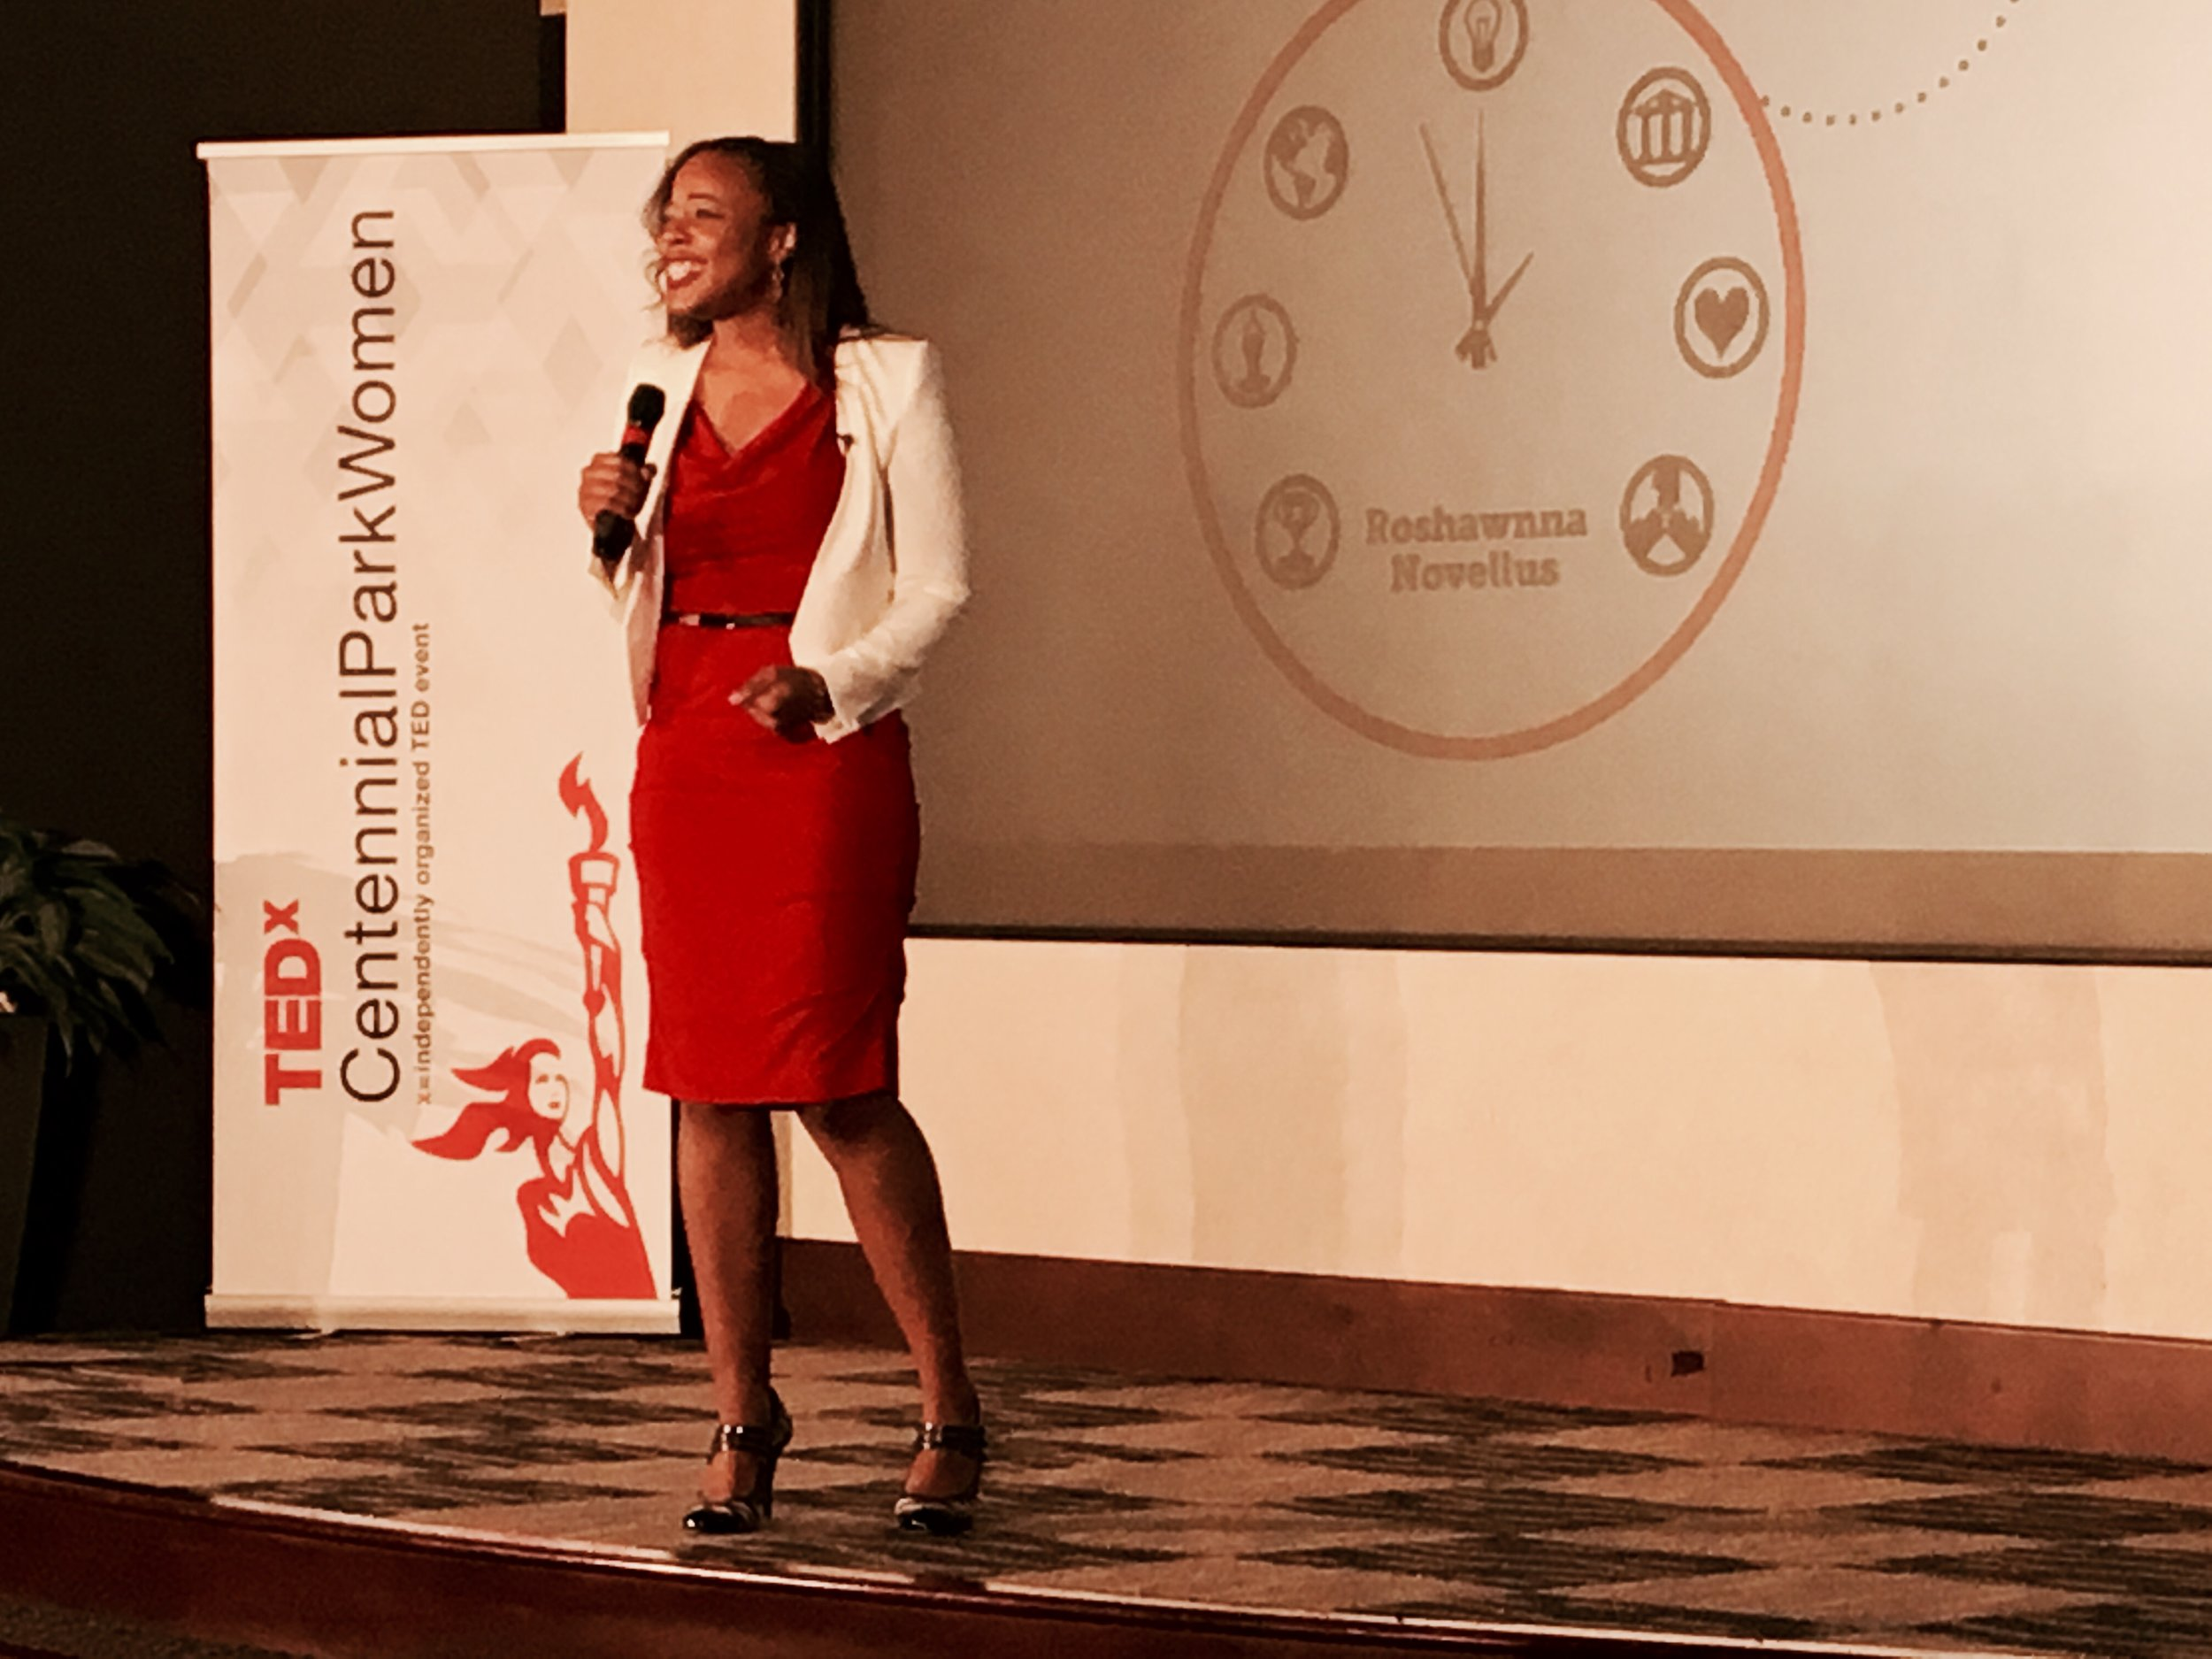 Dr. Roshawnna Novellus